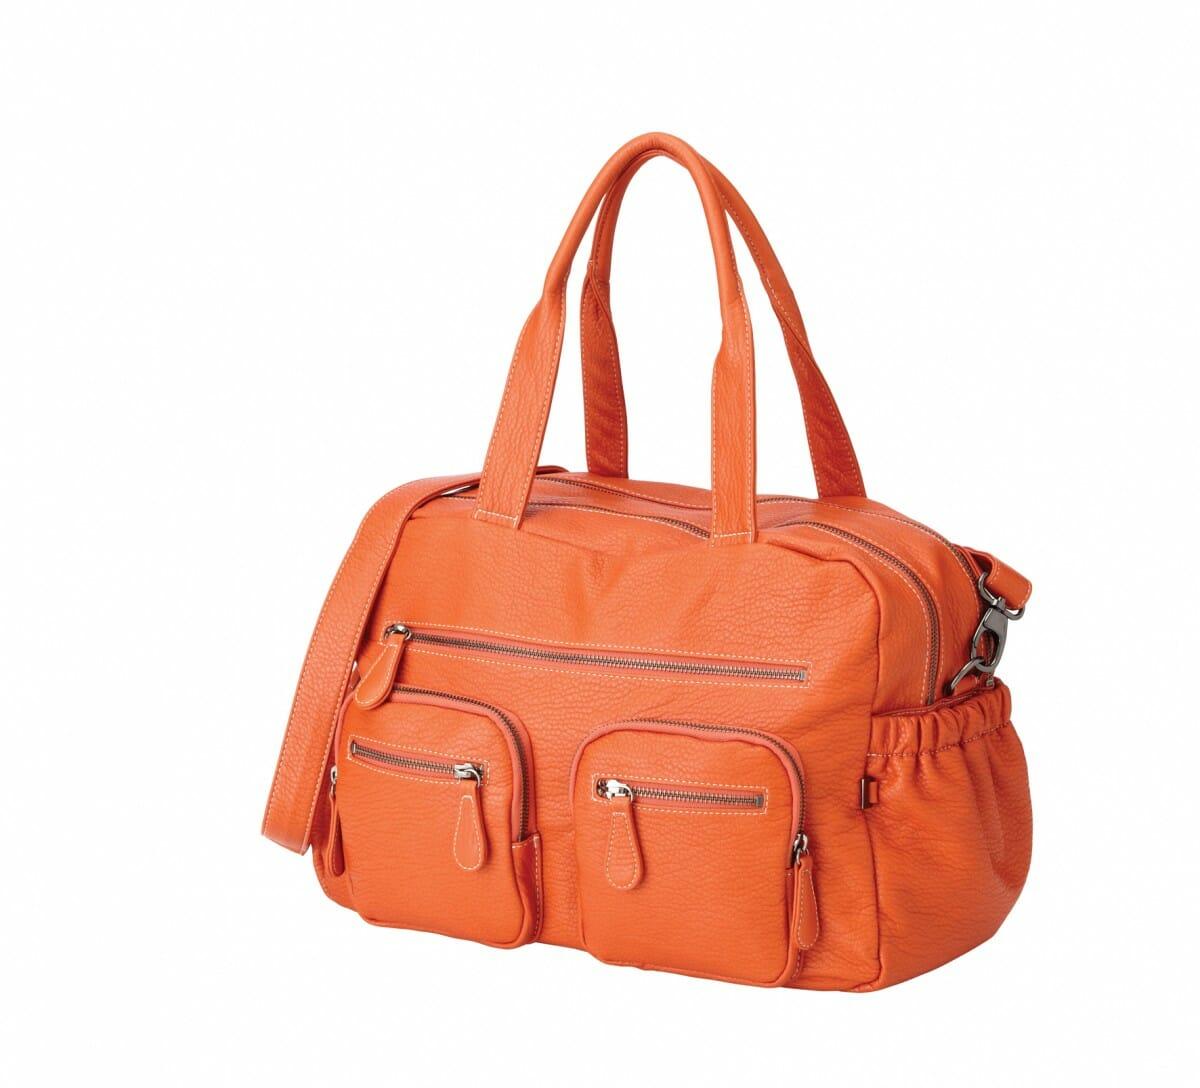 OiOi Tangerine Faux Buffalo Carry All Nappy Bag Angle